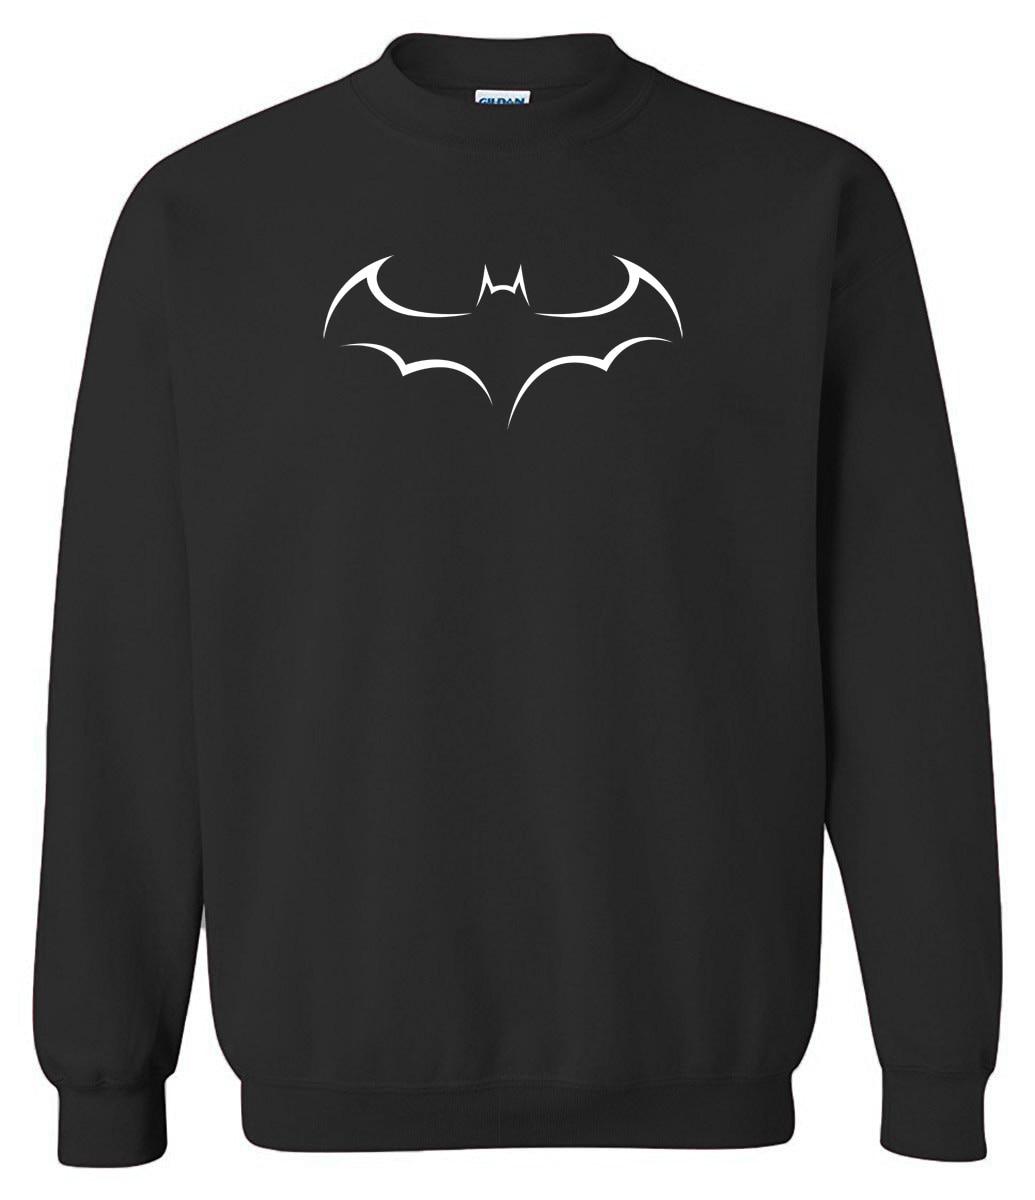 2019 Men's Sweatshirts Spring Winter BAT Printed Fashion Fleece Casual Hoodies For Men Harajuku Brand Clothing Hoody Sportswear